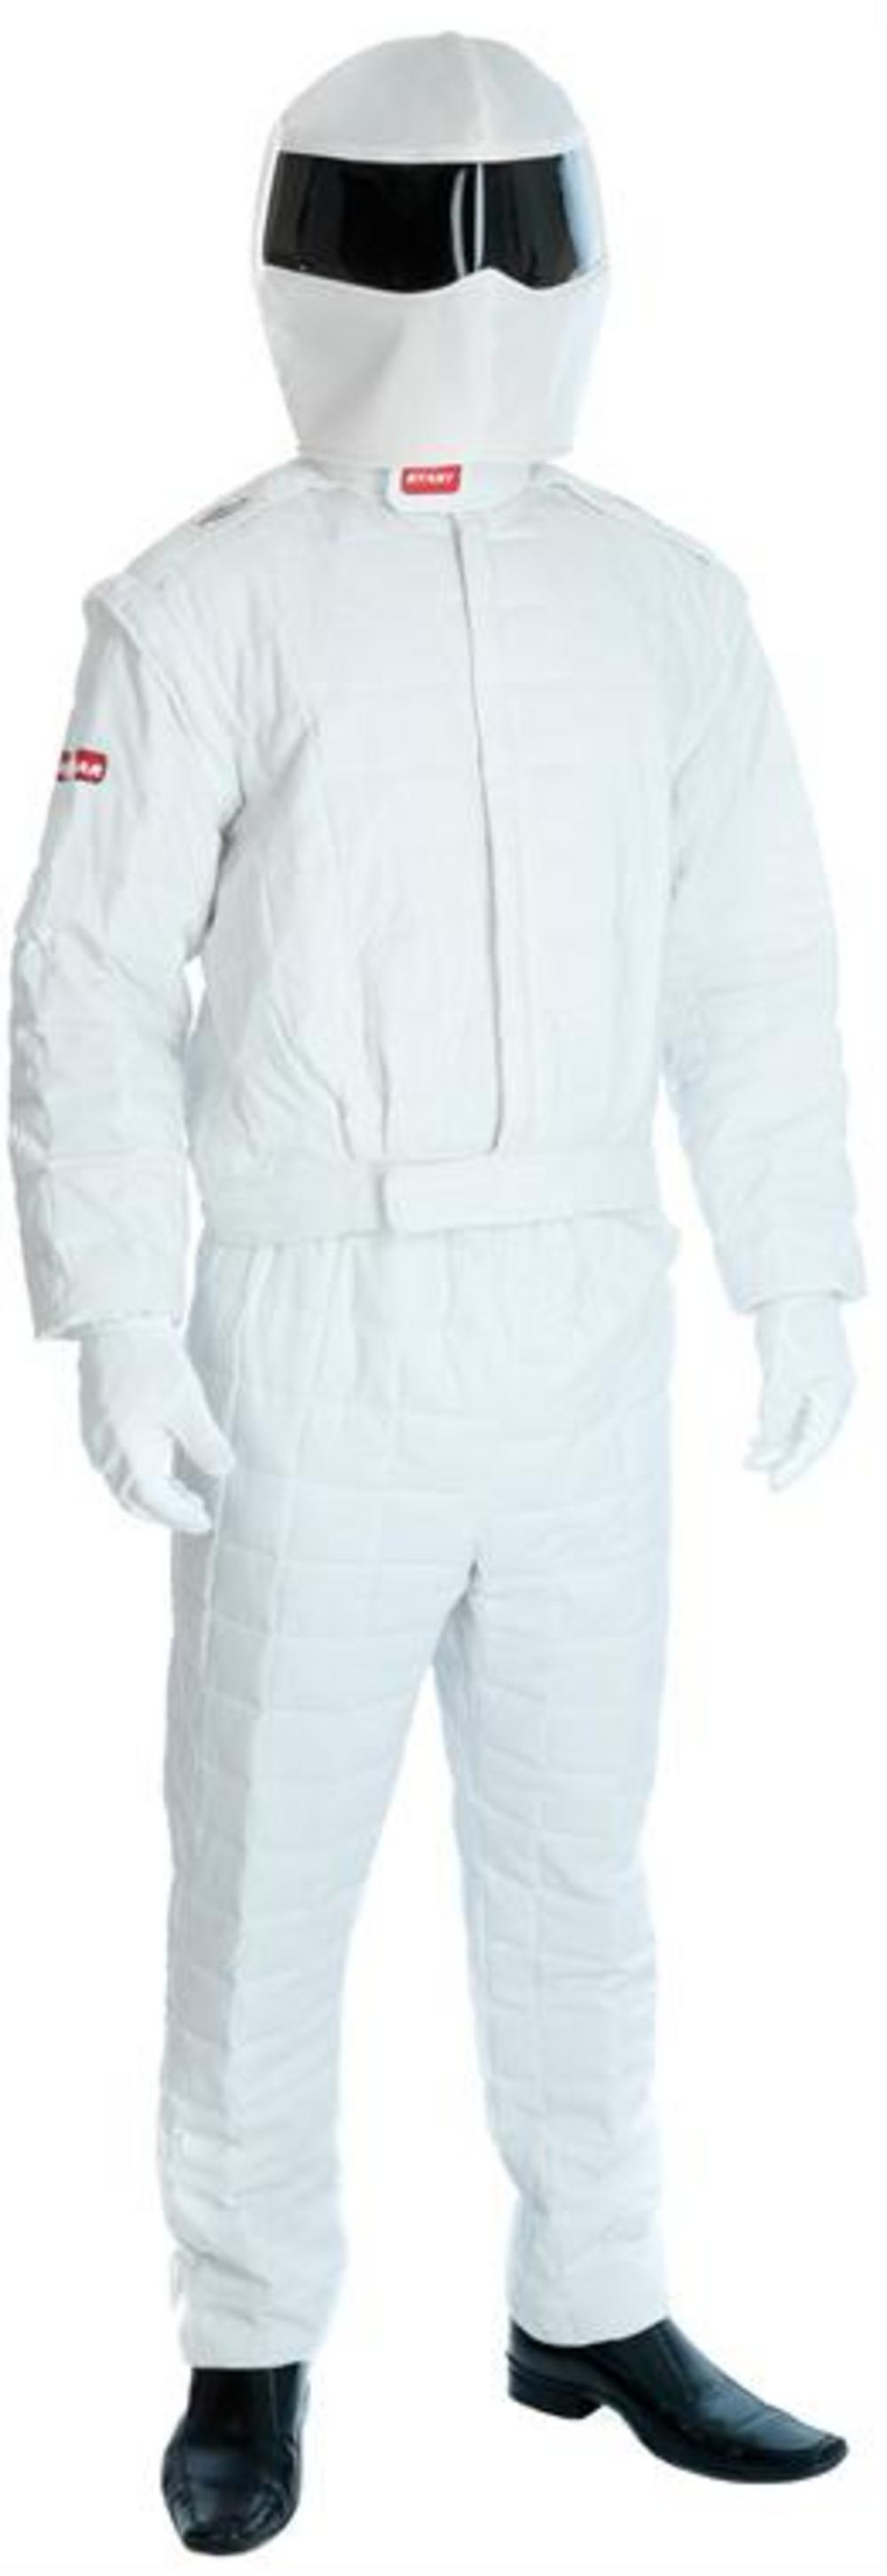 Mens Racing Driver Fancy Dress Costume